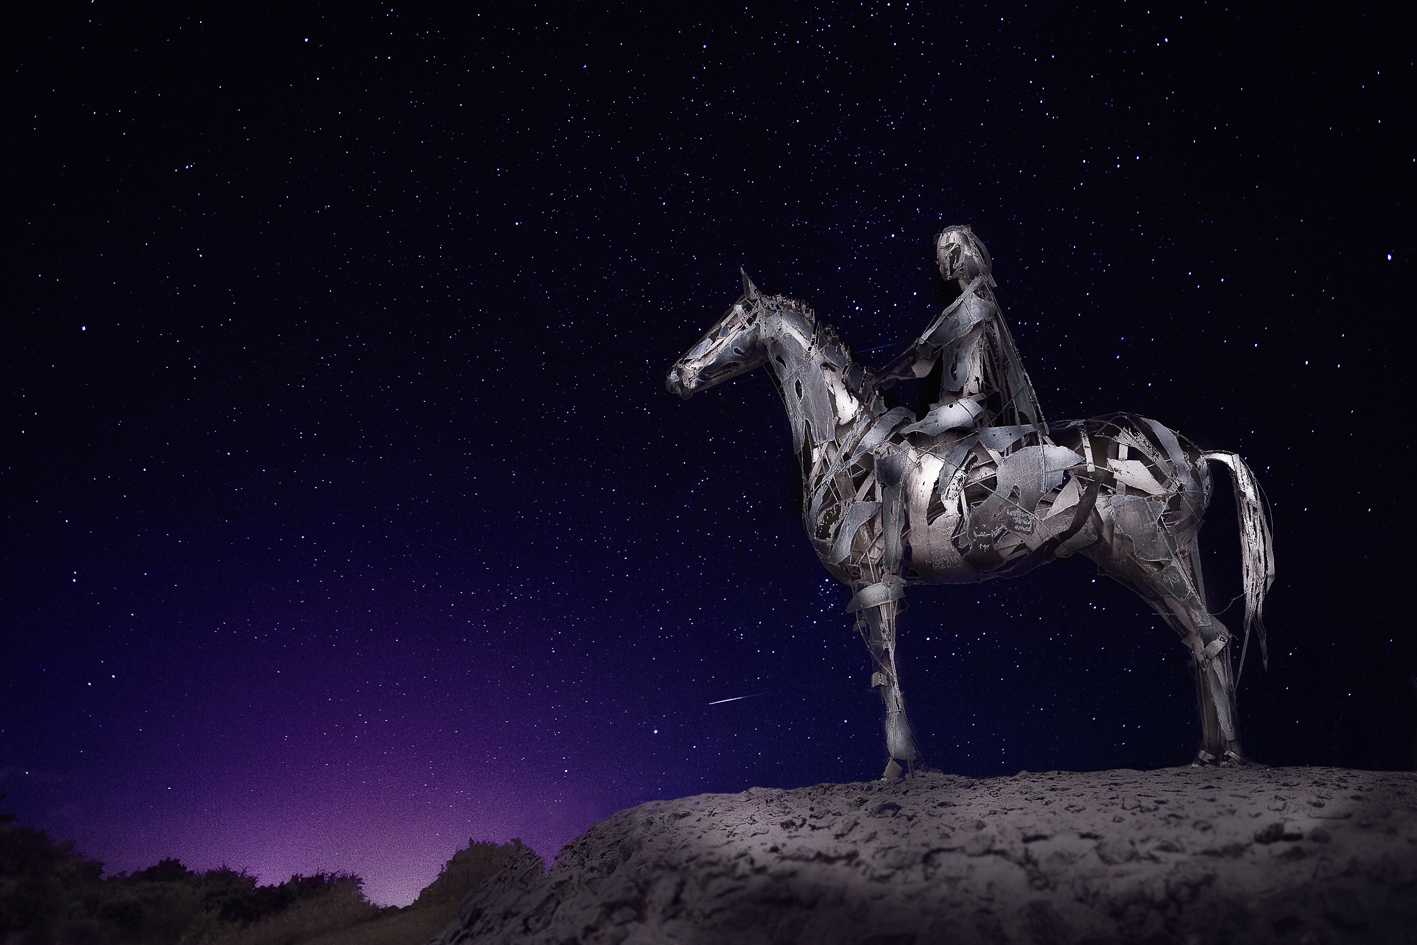 Waiting Horseman